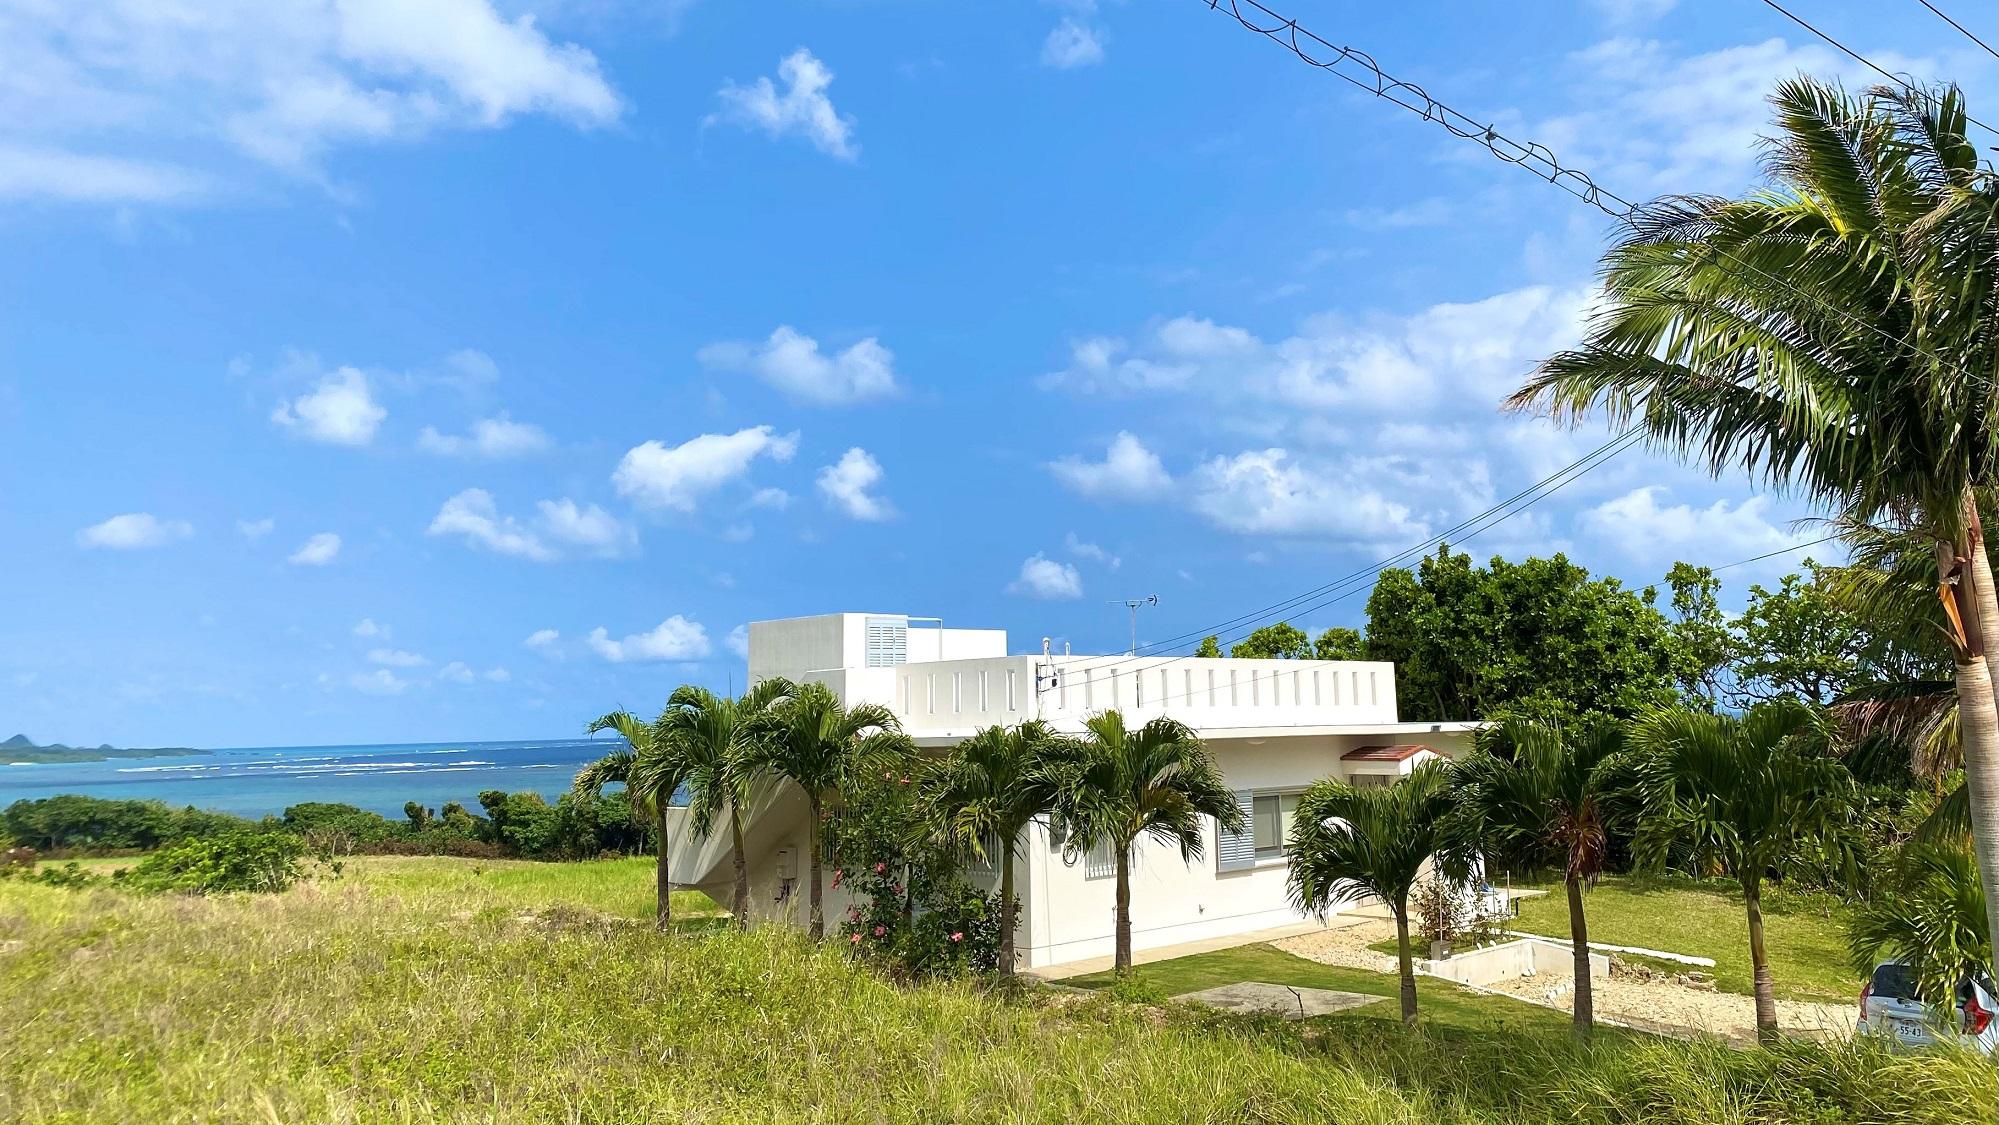 Villa Crystal Beach<石垣島>